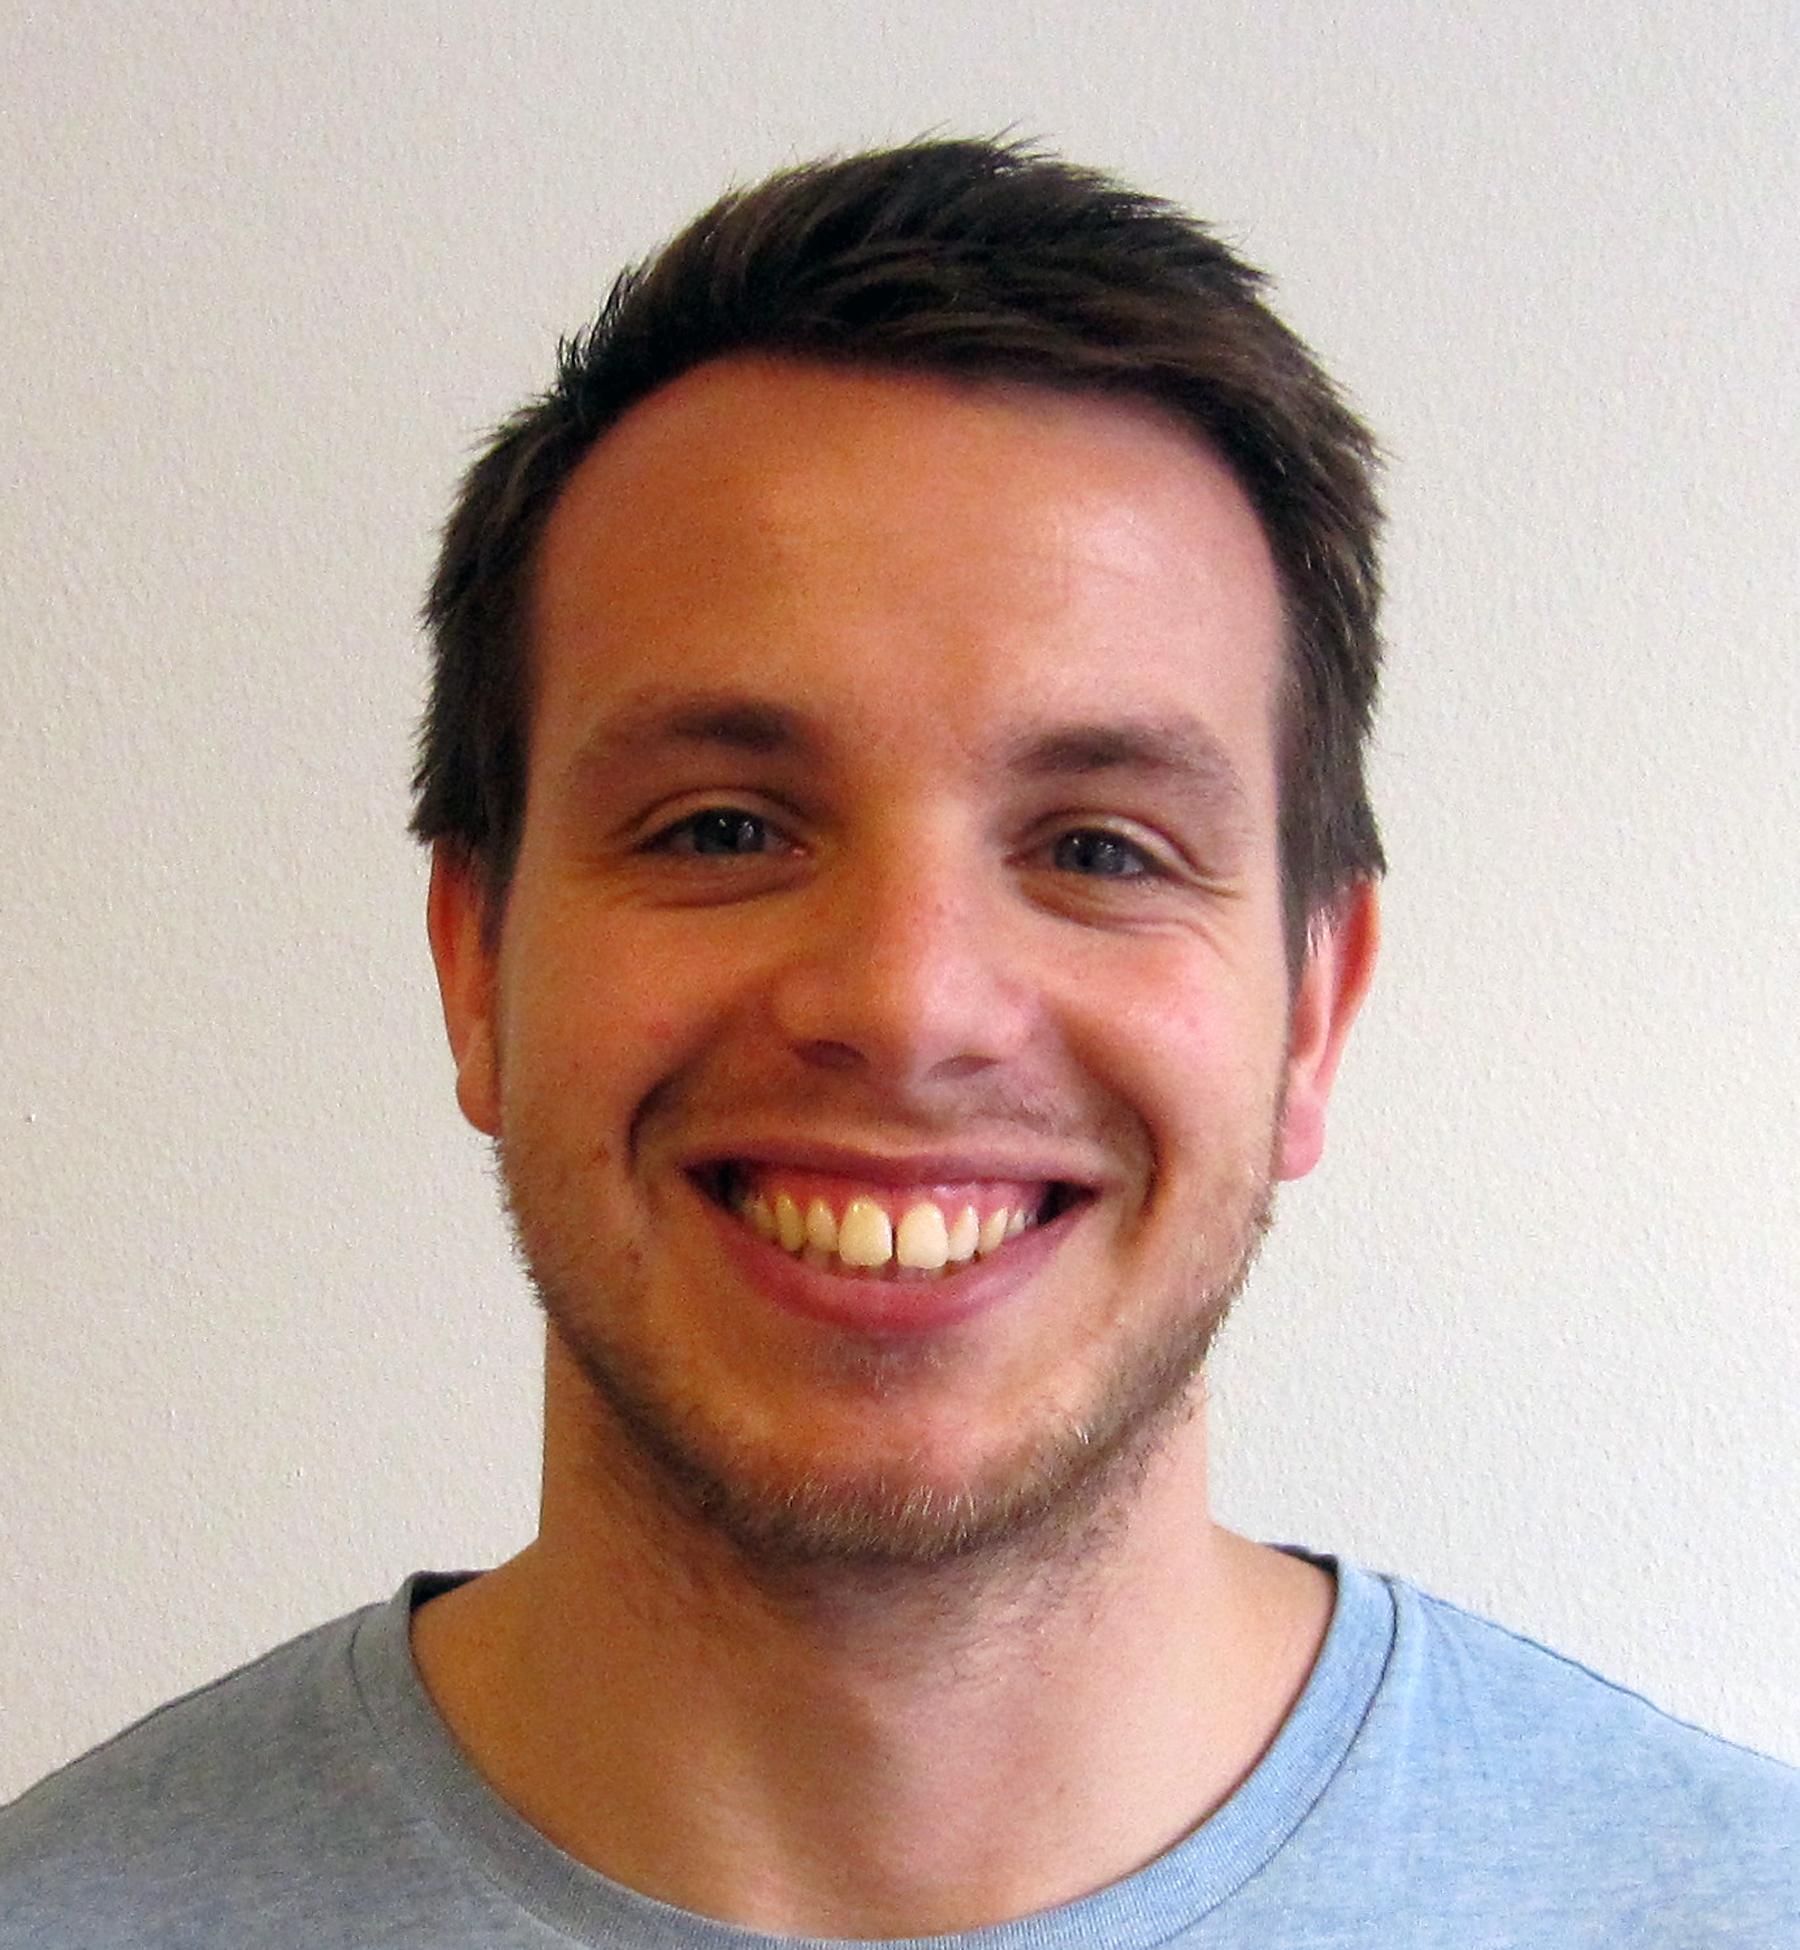 David Getreuer Jensen